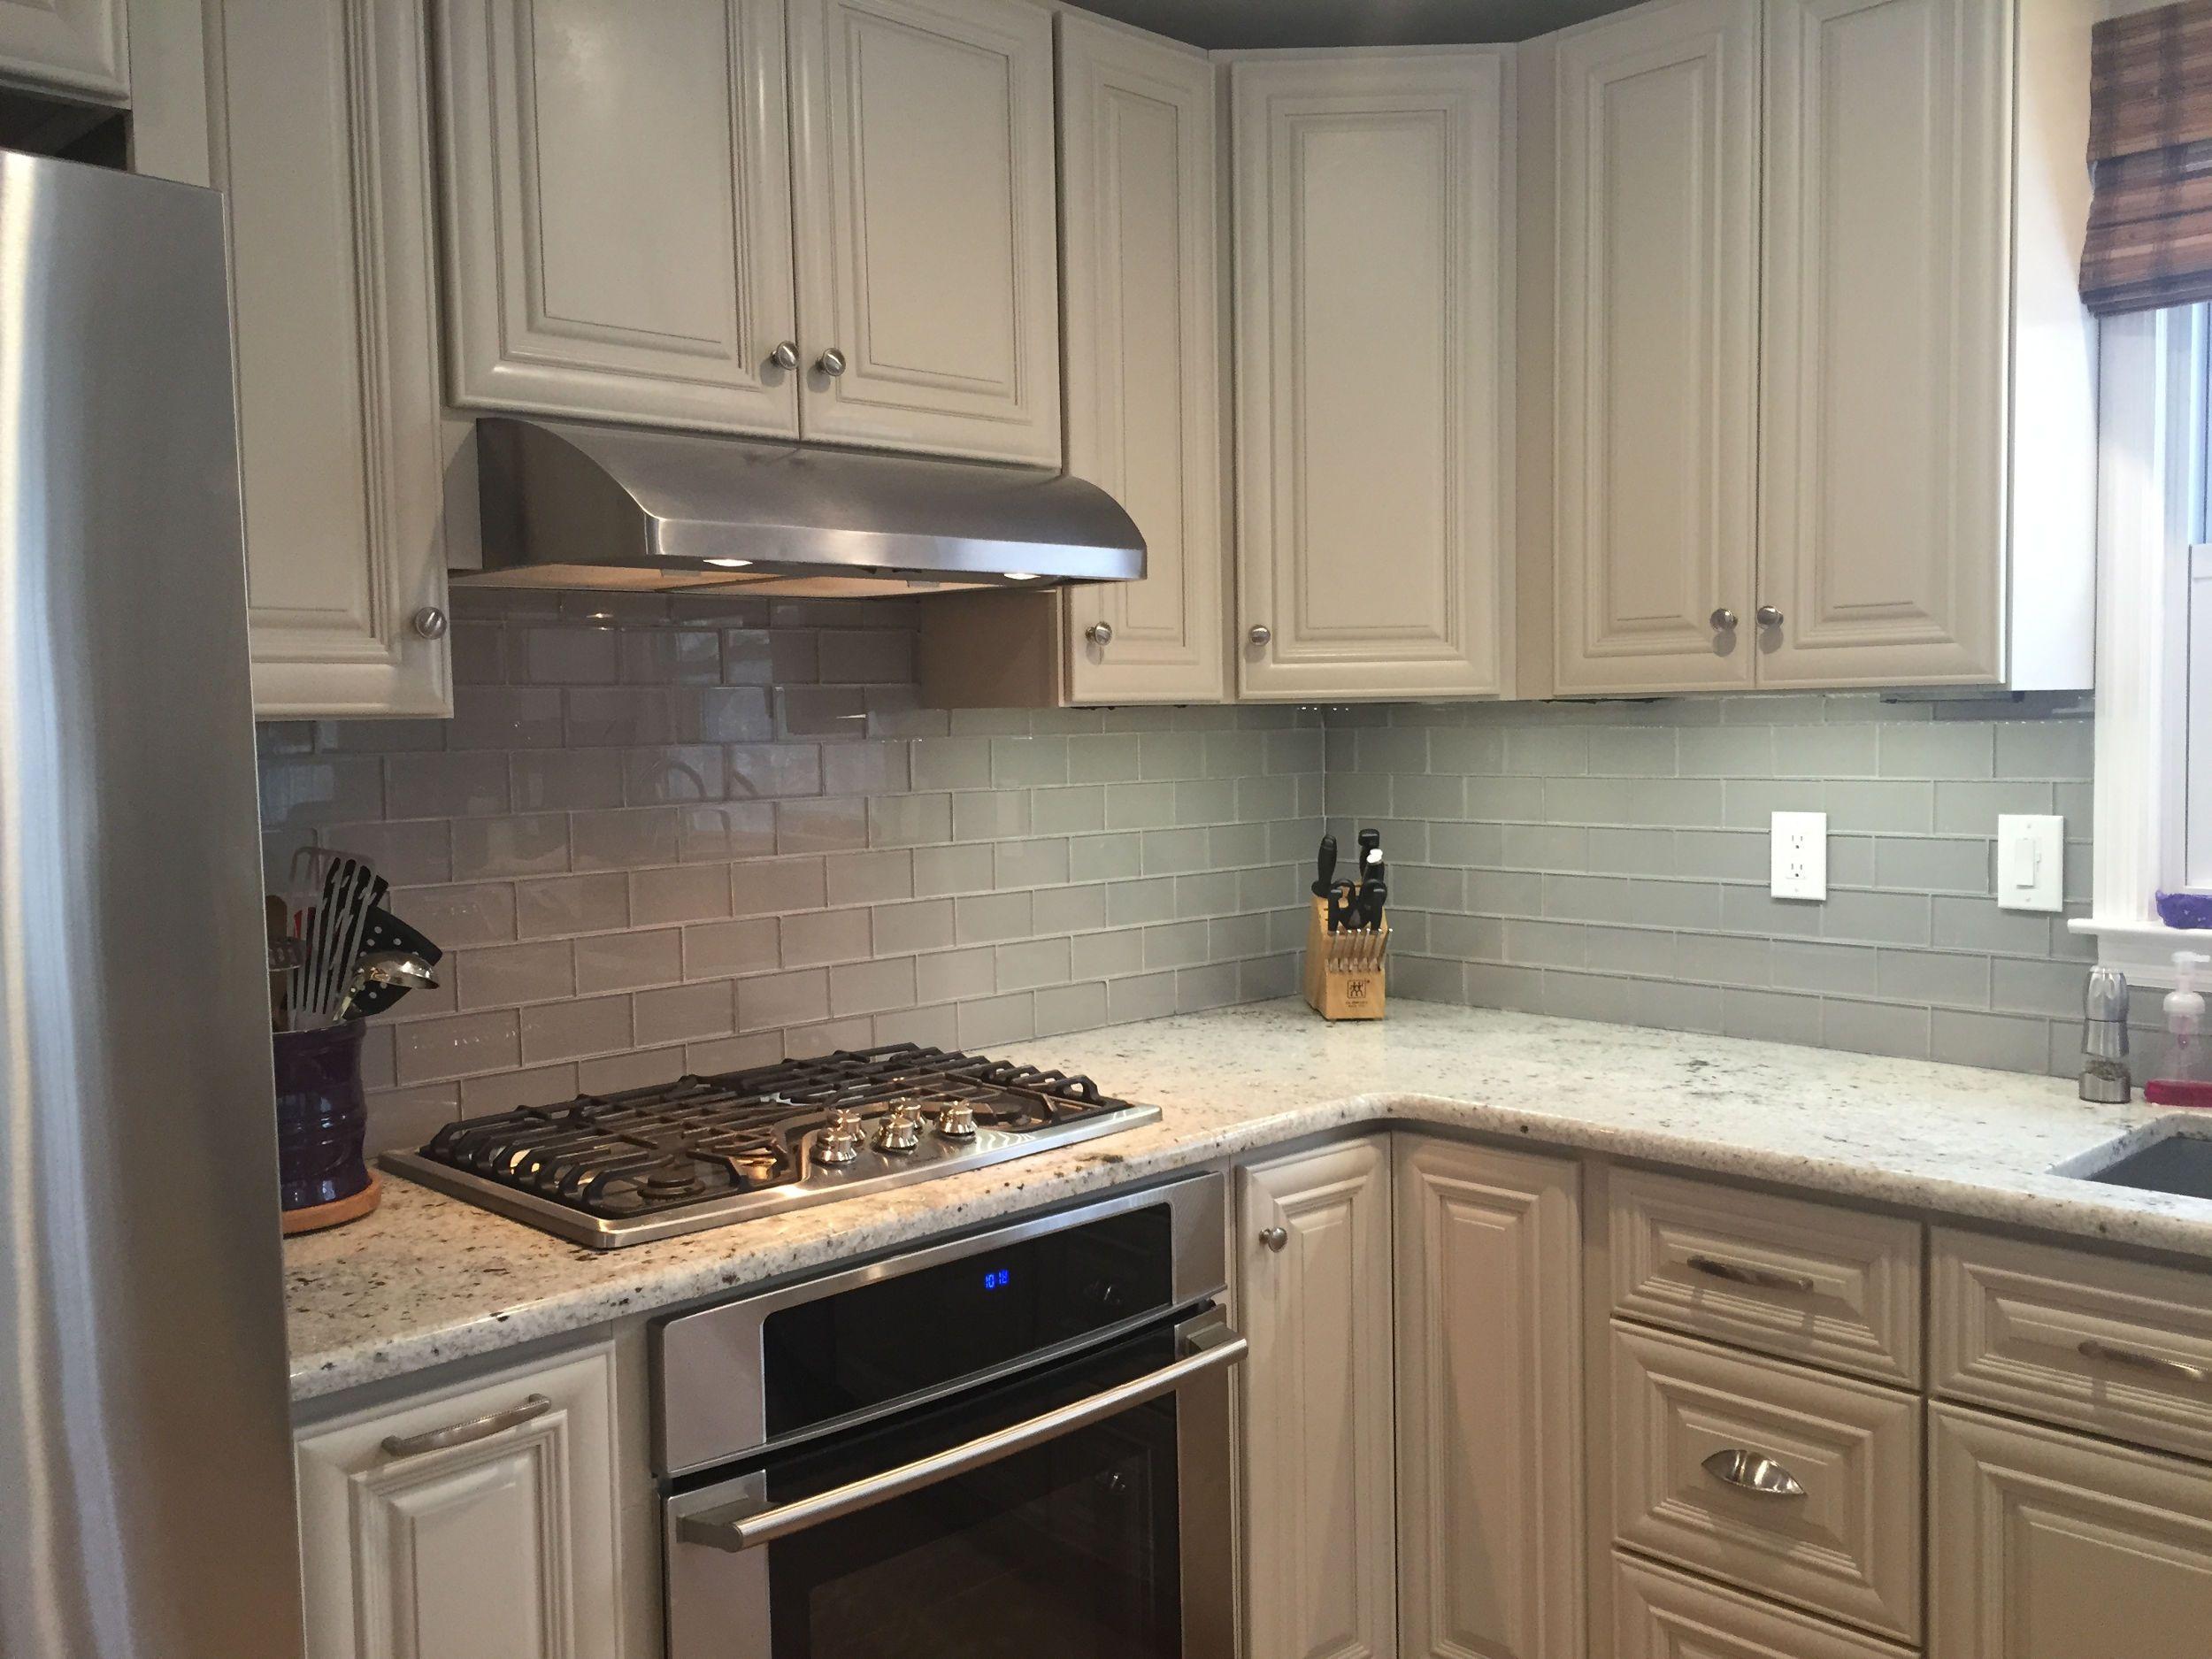 White Kitchen Cabinets With Backsplash